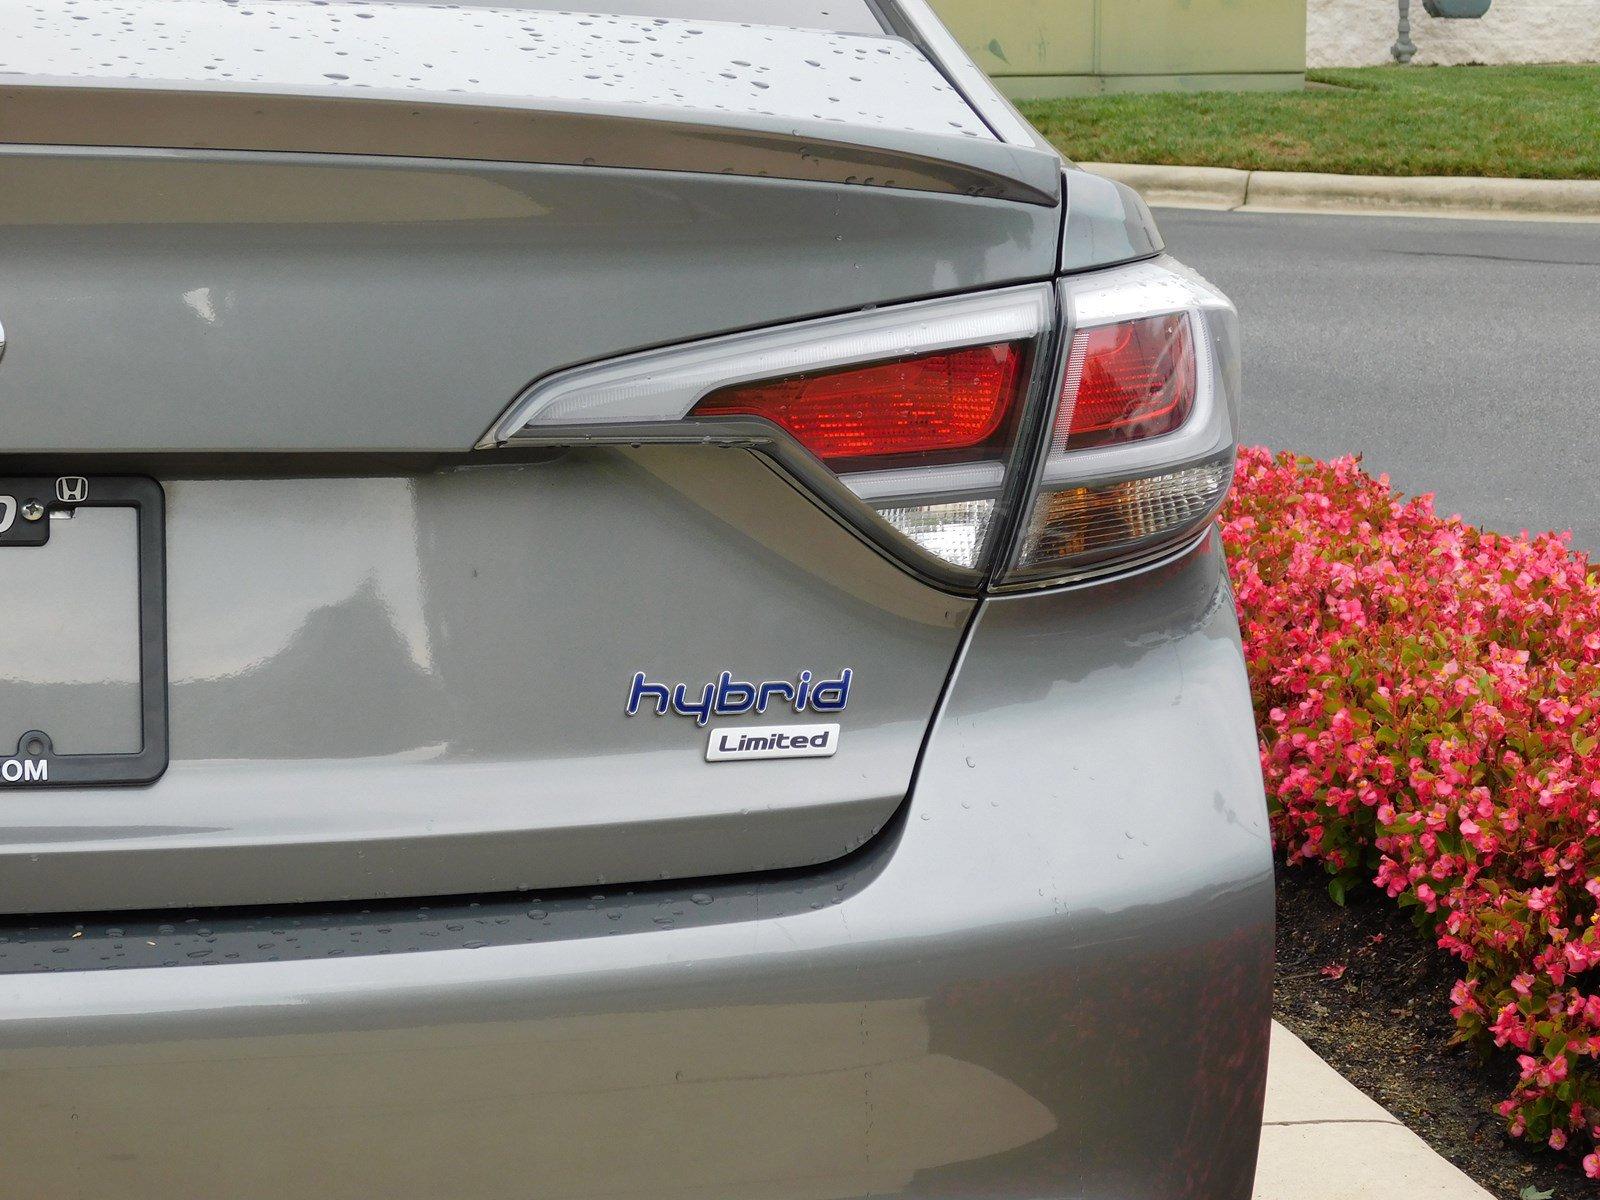 Pre-Owned 2017 Hyundai Sonata Hybrid Limited